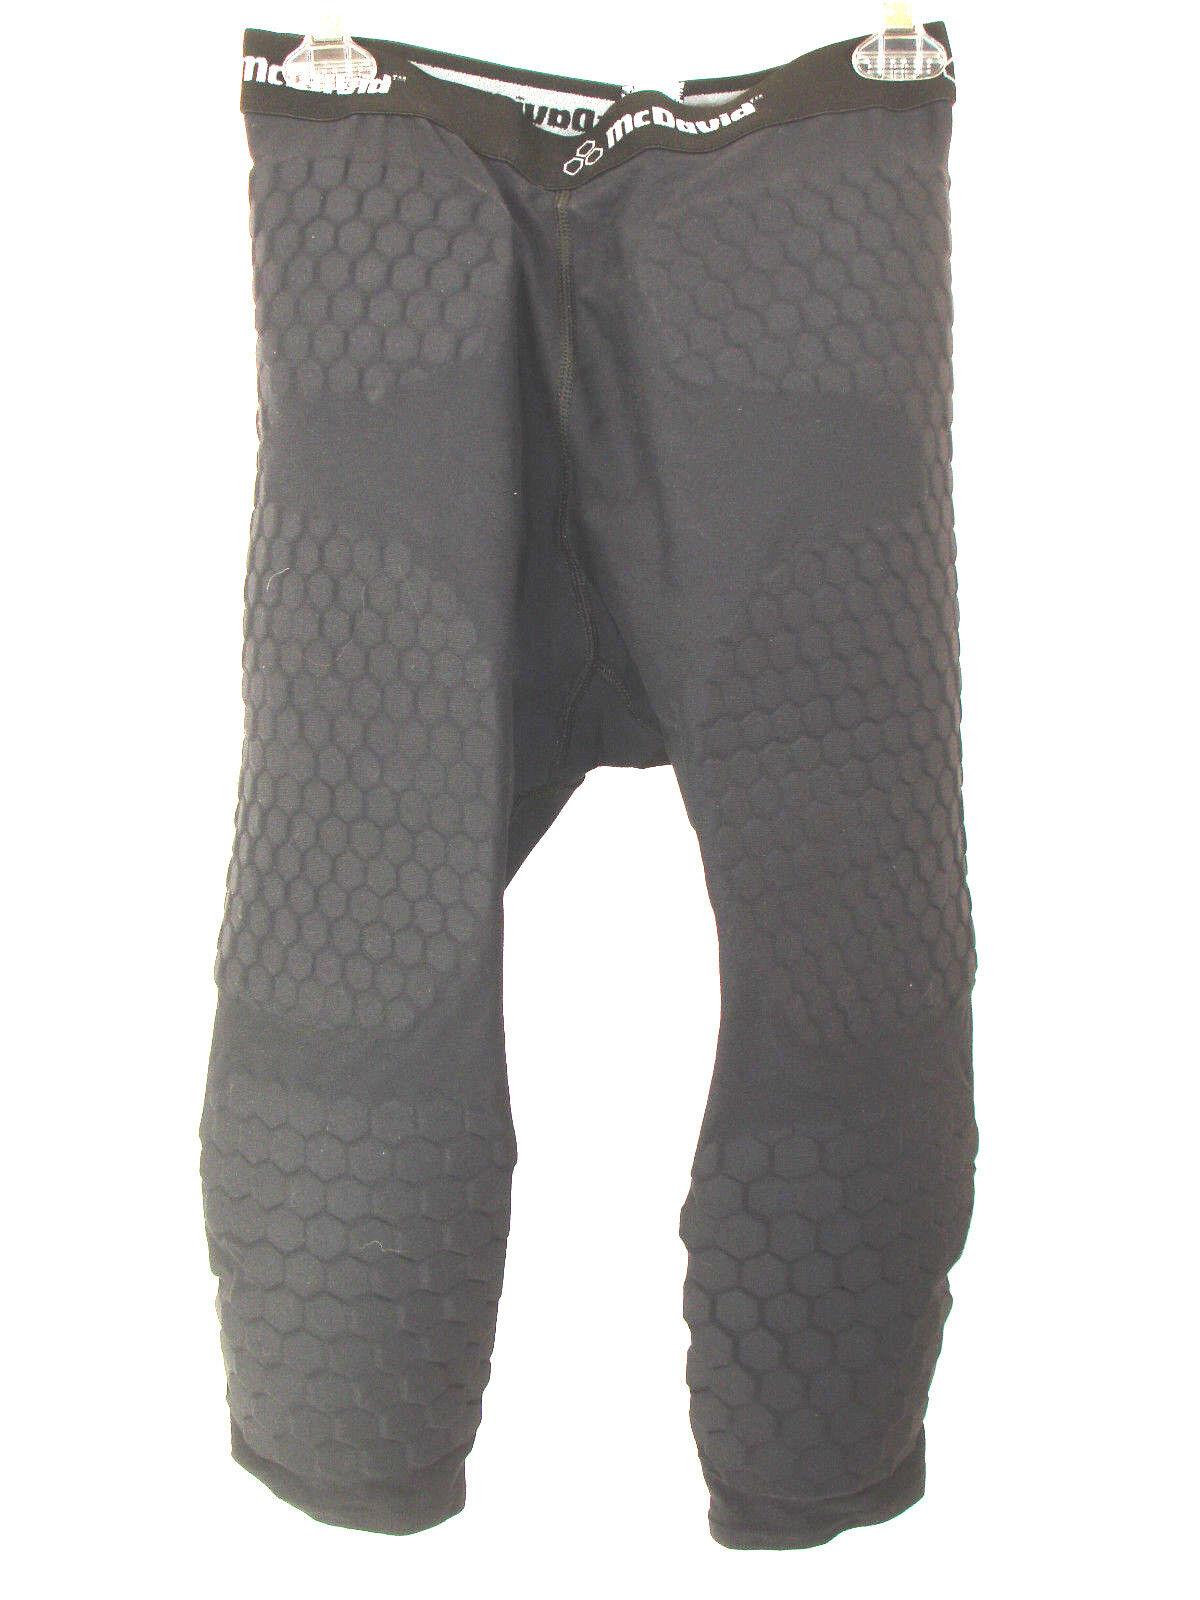 McDavid Womens Large Hex-Pad Calf Length Predective Padded Pants